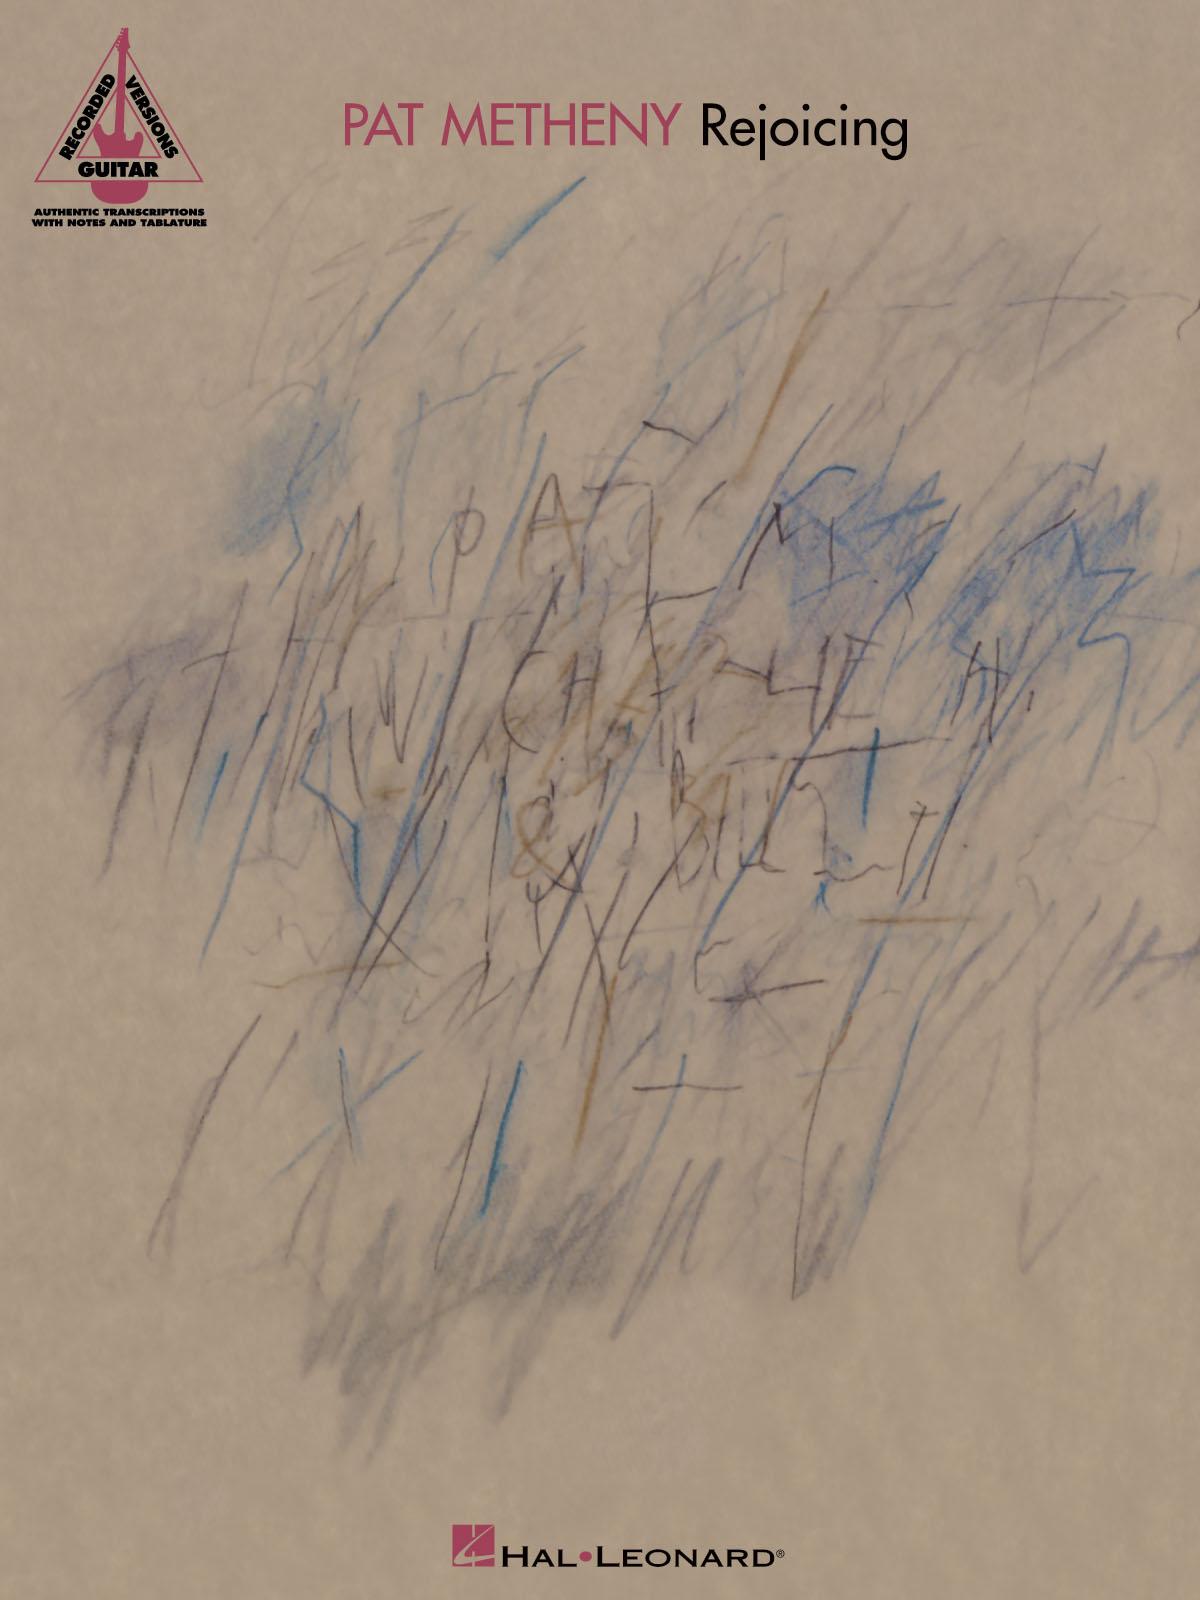 Pat Metheny: Pat Metheny - Rejoicing: Guitar Solo: Artist Songbook